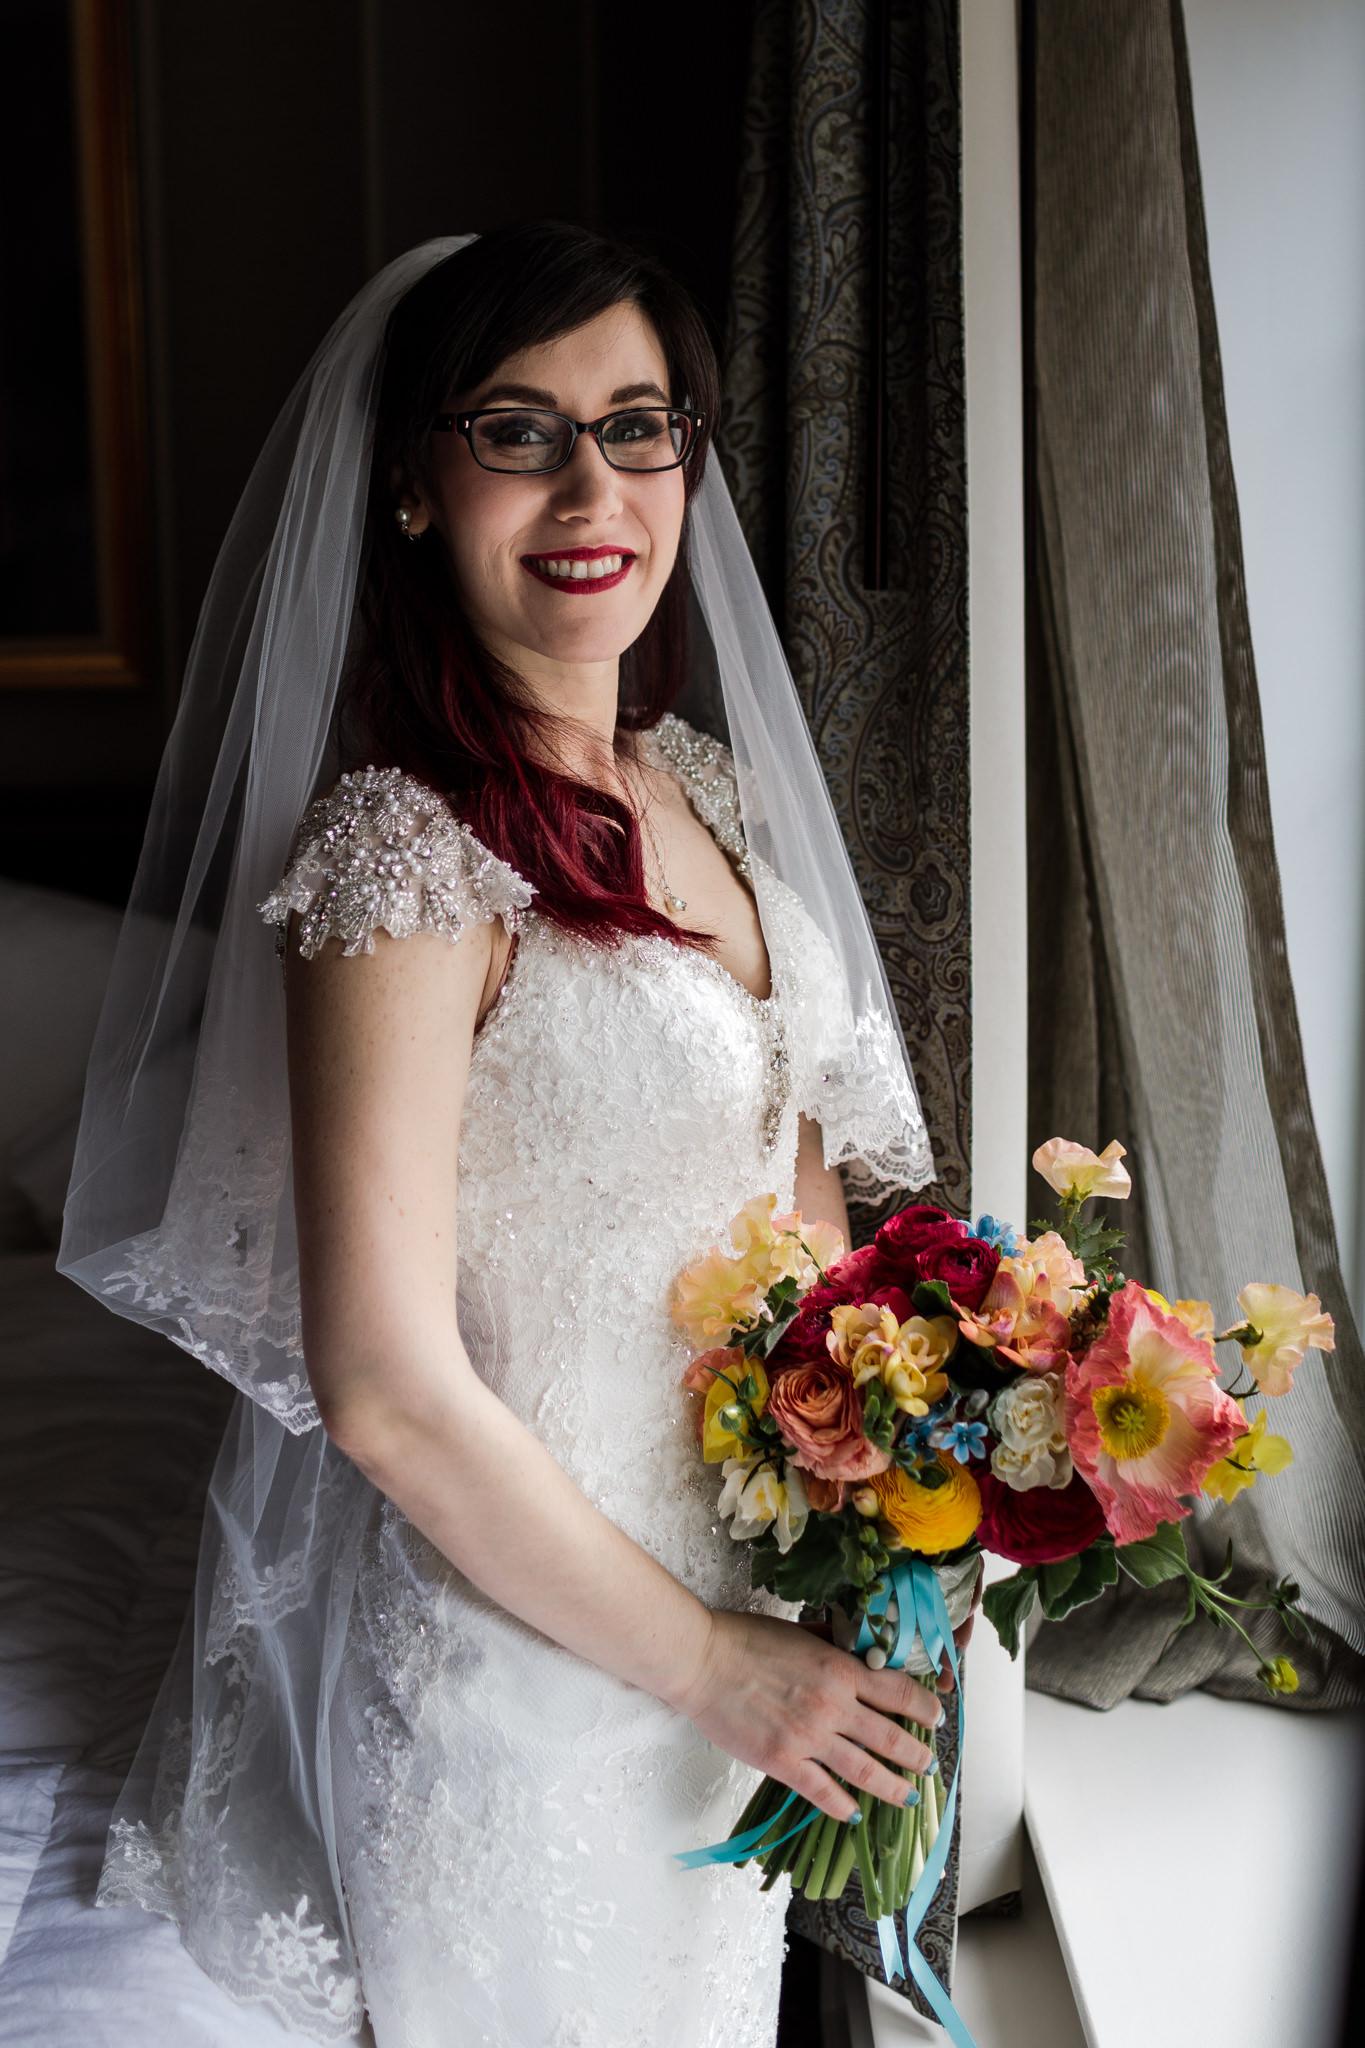 Hanchar_Madison_Hotel_NJ_Wedding_7R5A8160-Edit.jpg